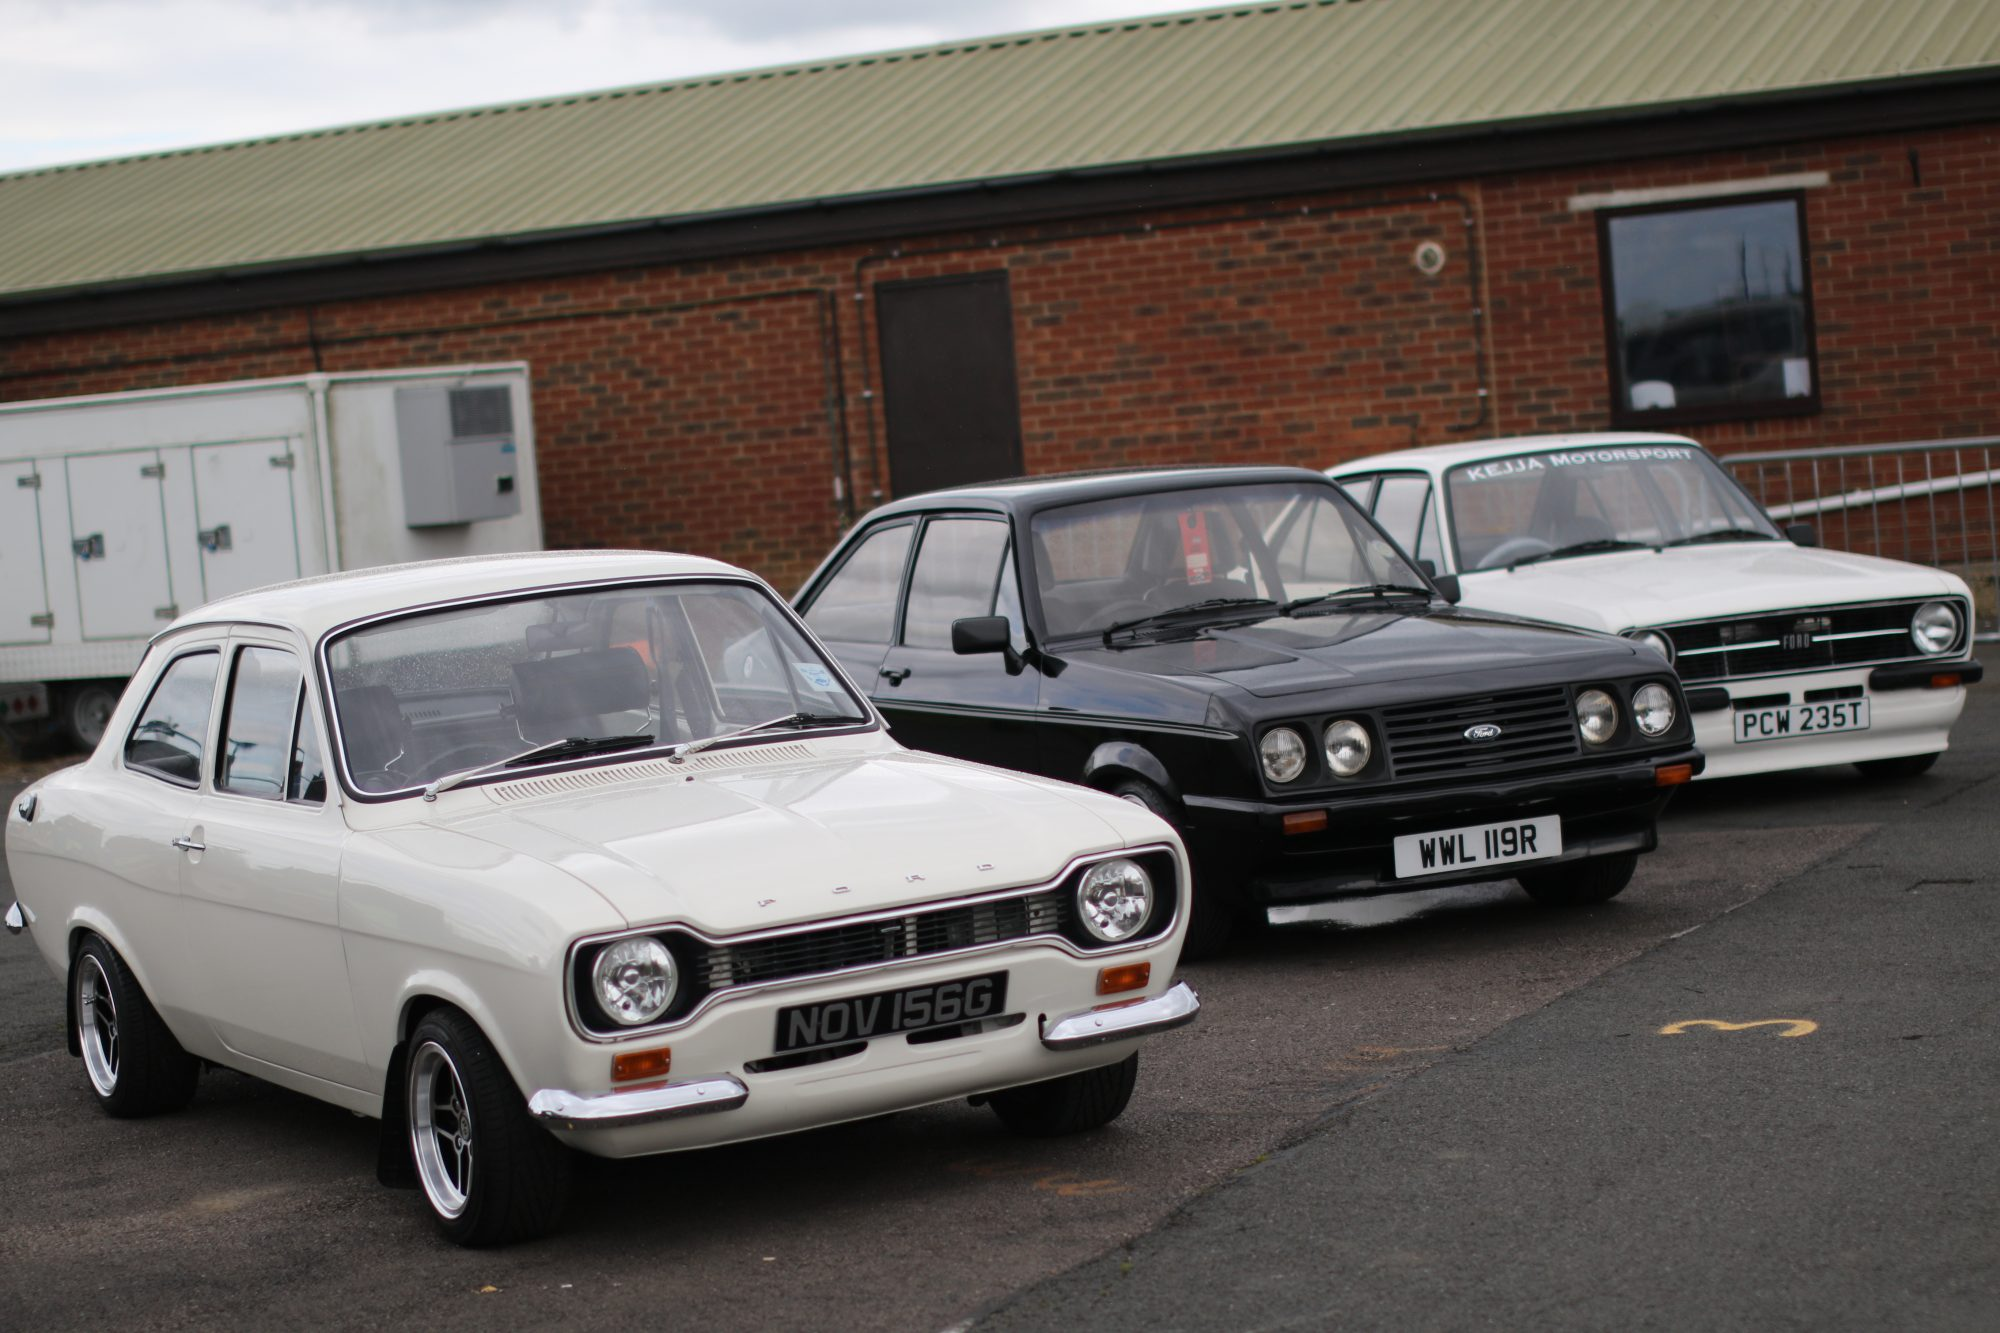 Retro Show, Retro cars, motoring, automotive, car show, car meet, classic car, Mk1 Escort